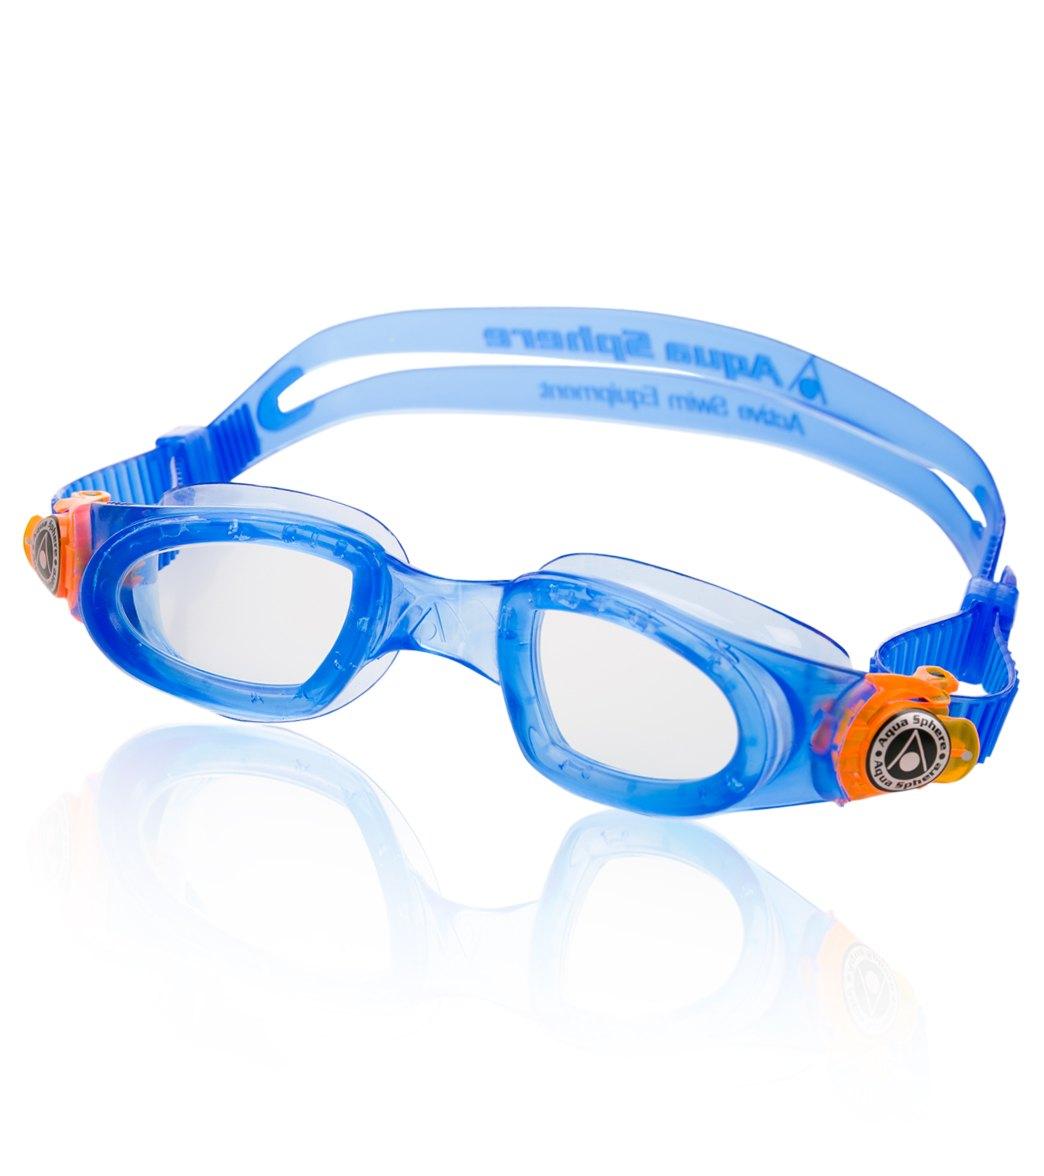 13623b13f1c5 Aqua Sphere Moby Kid Goggle Clear at SwimOutlet.com